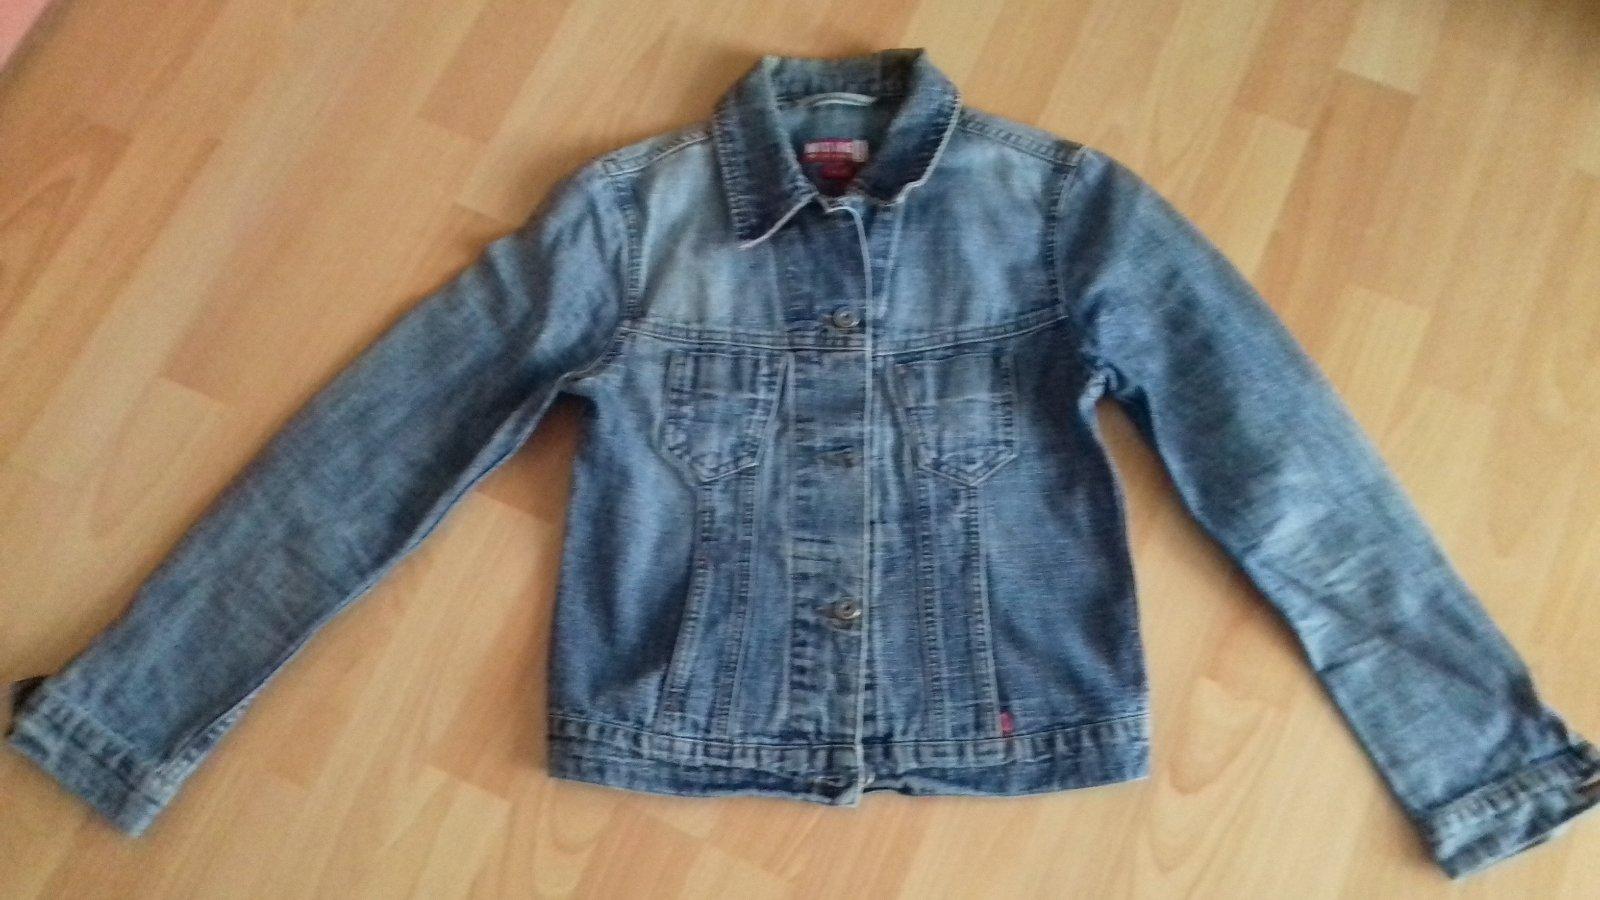 e85e13c722 Dámska modrá rifľová bunda zn.mustang